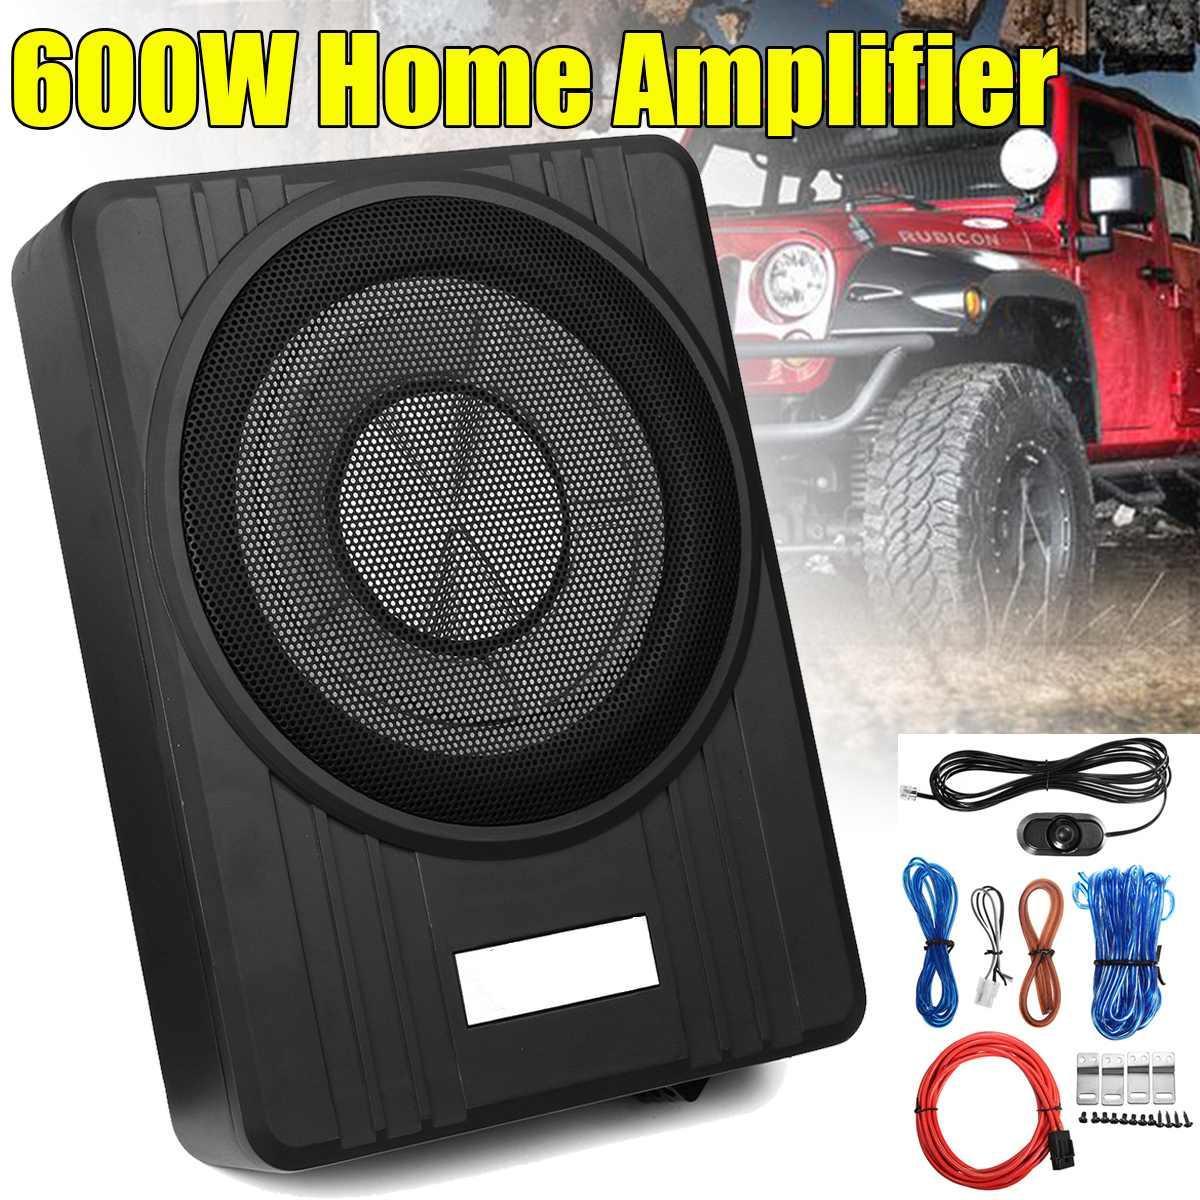 Bass-Amplifier Speaker Enclosure Subwoofers Under-Seat Slim 600W 10inch Car